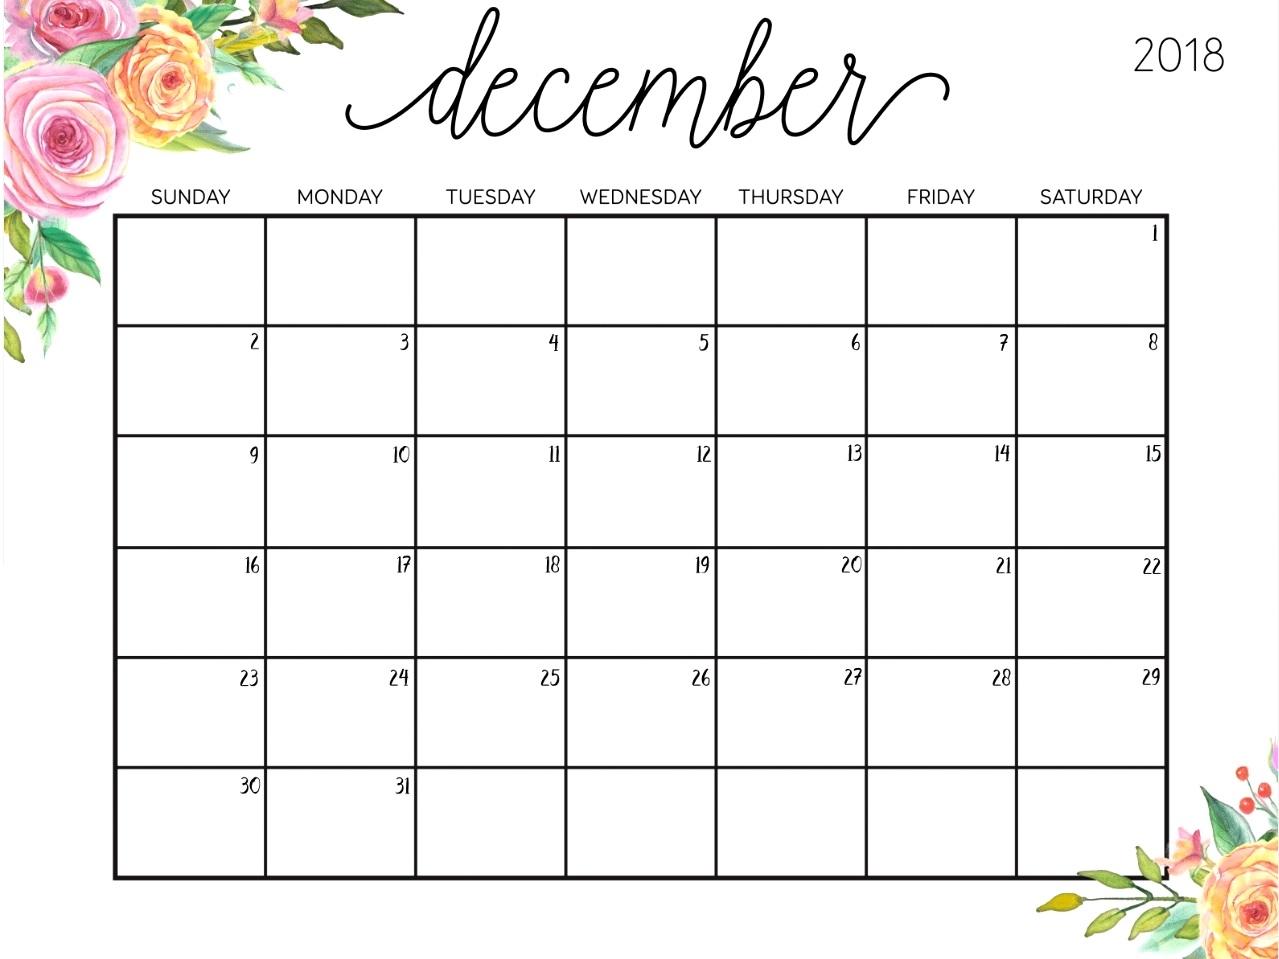 december 2018 cute calendar printable printable calendar 2018::December 2018 Calendar Printable Template